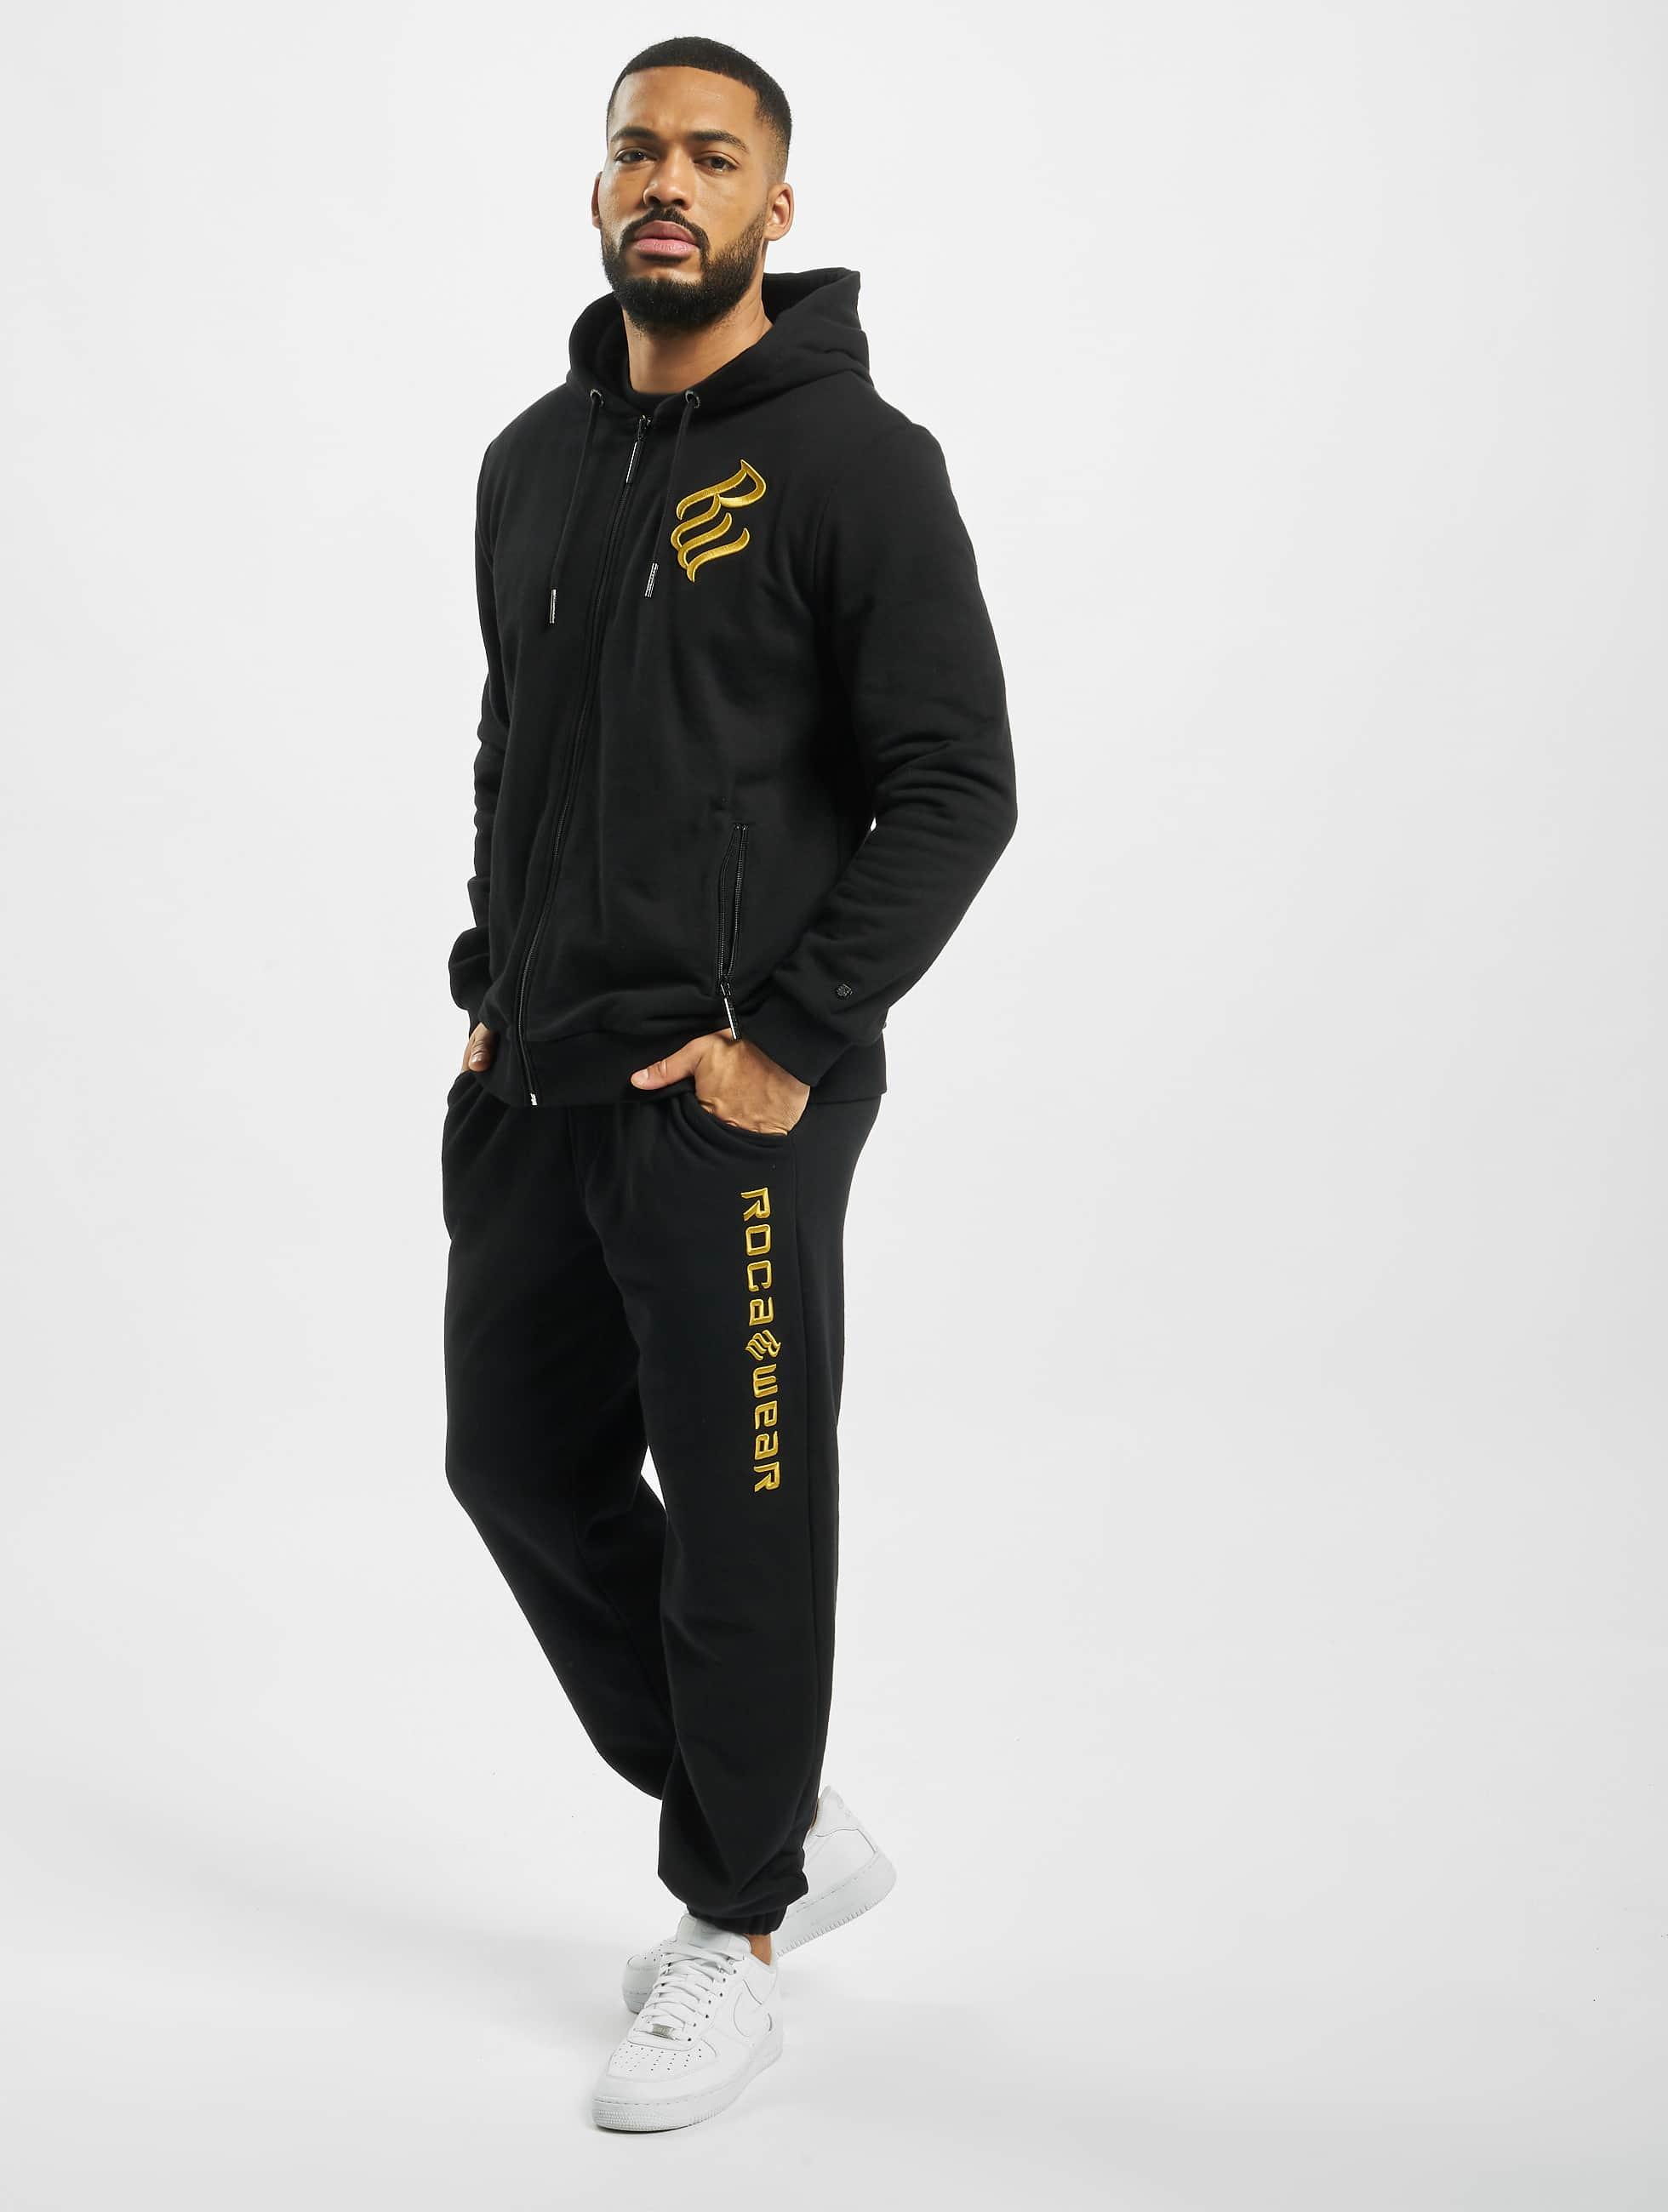 Rocawear / Suits Midas in black M